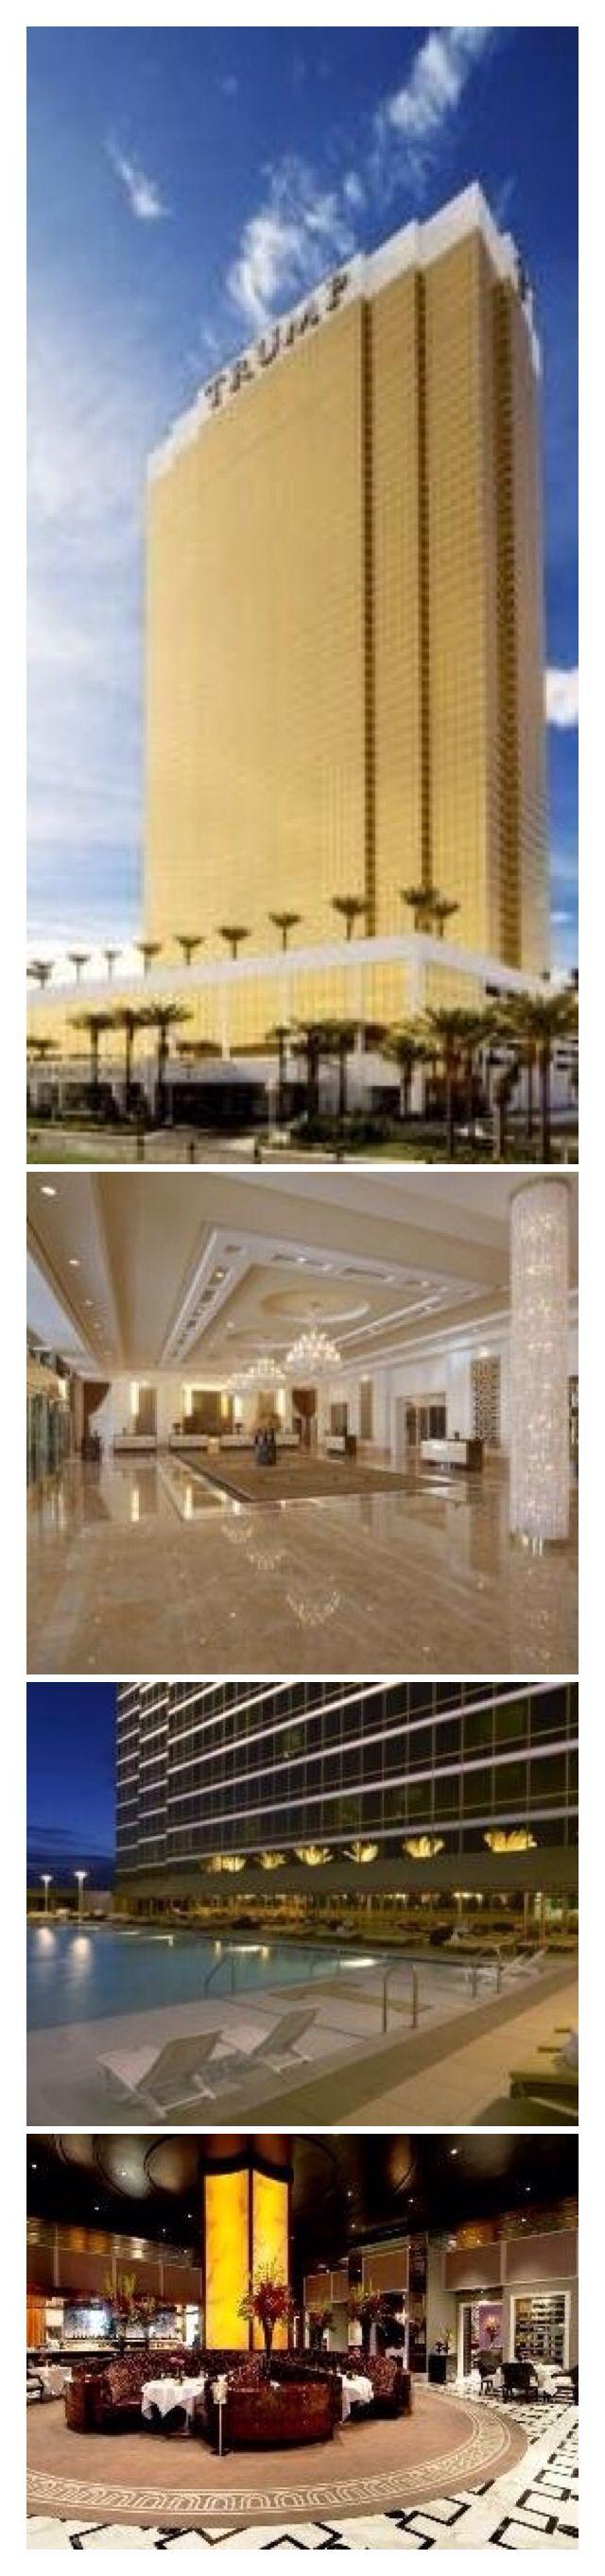 ~Trump Towers Hotel/Casino - Las Vegas Nevada | House of Beccaria